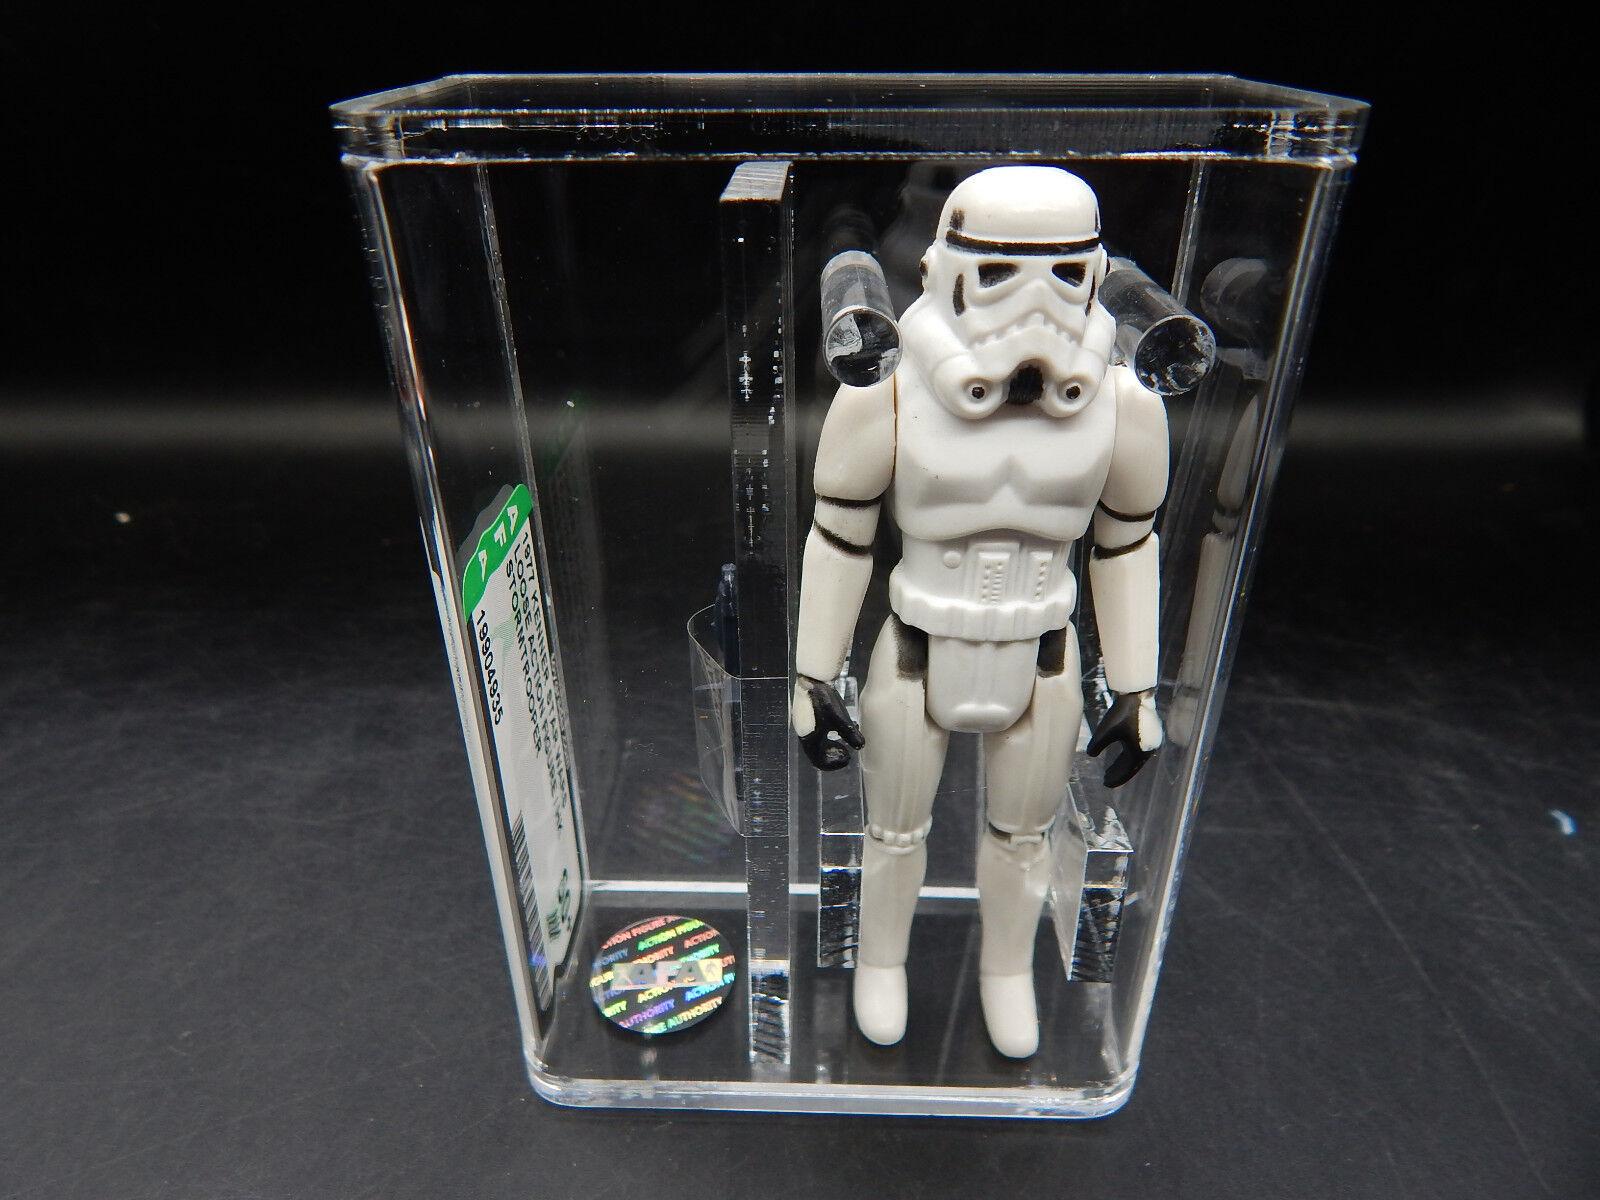 AFA 80+ Star Wars Imperial STORMTROOPER Kenner 1977 vintage action figure toy